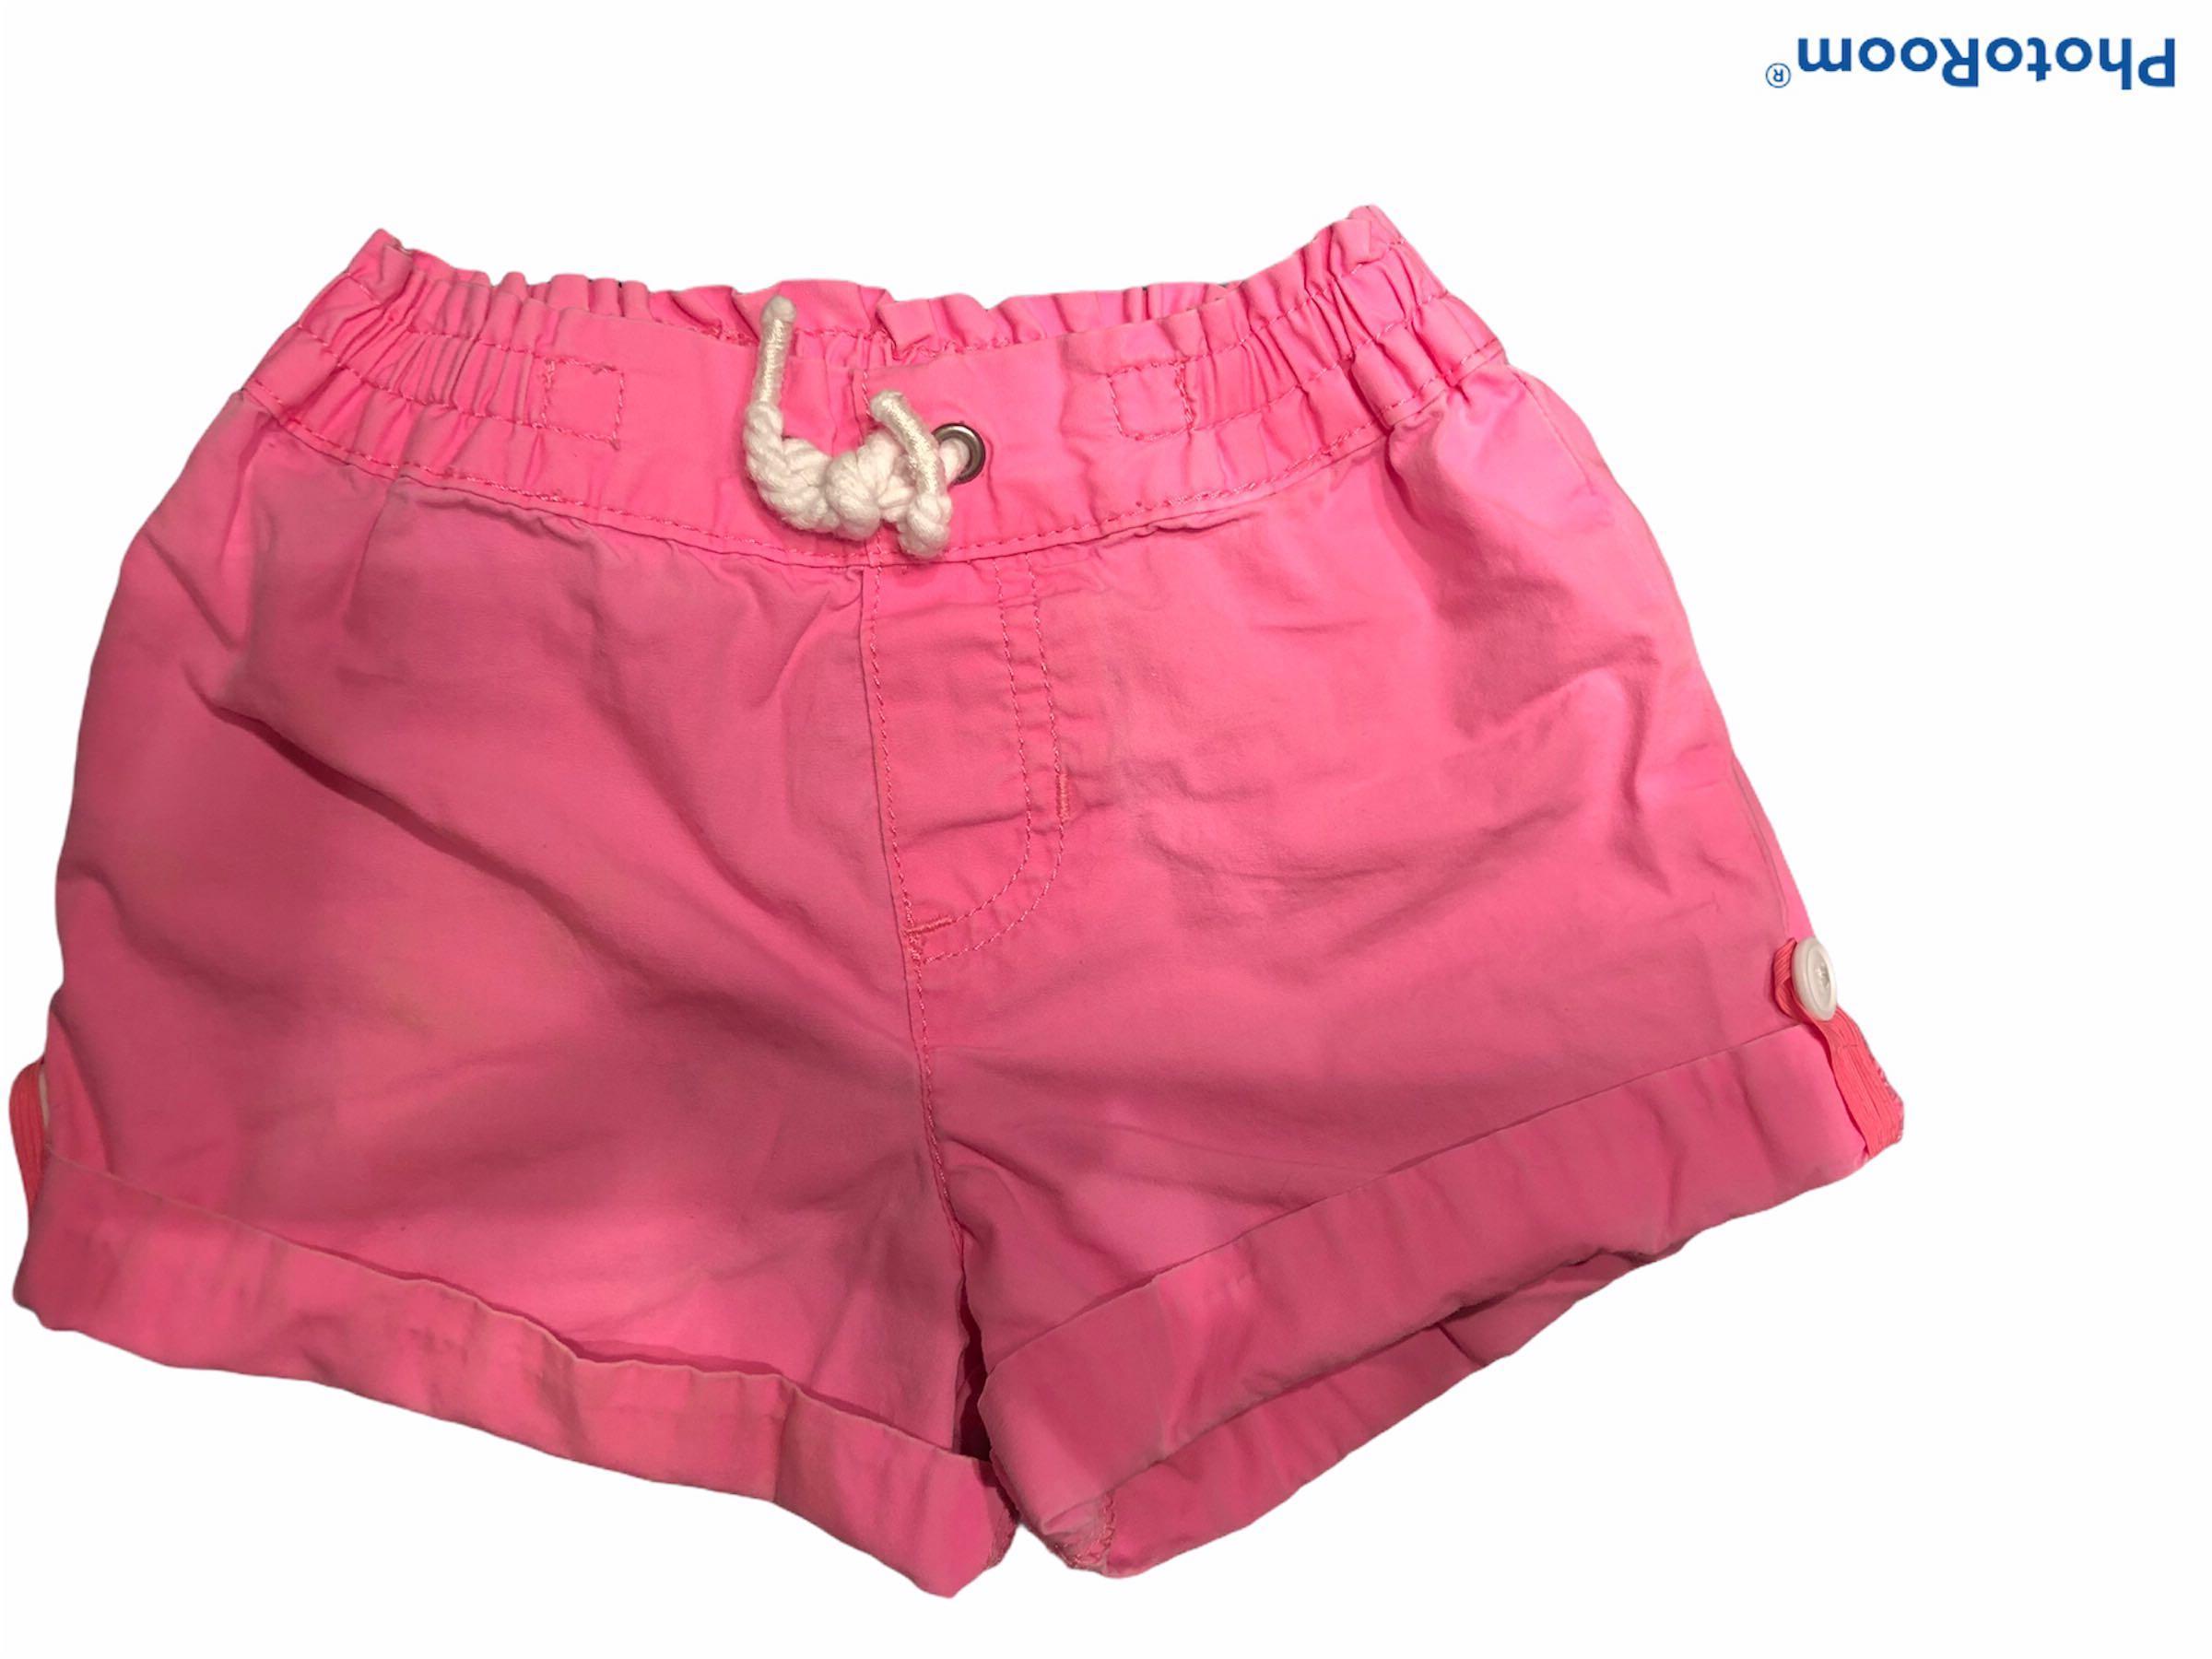 Shorts 4T Pink